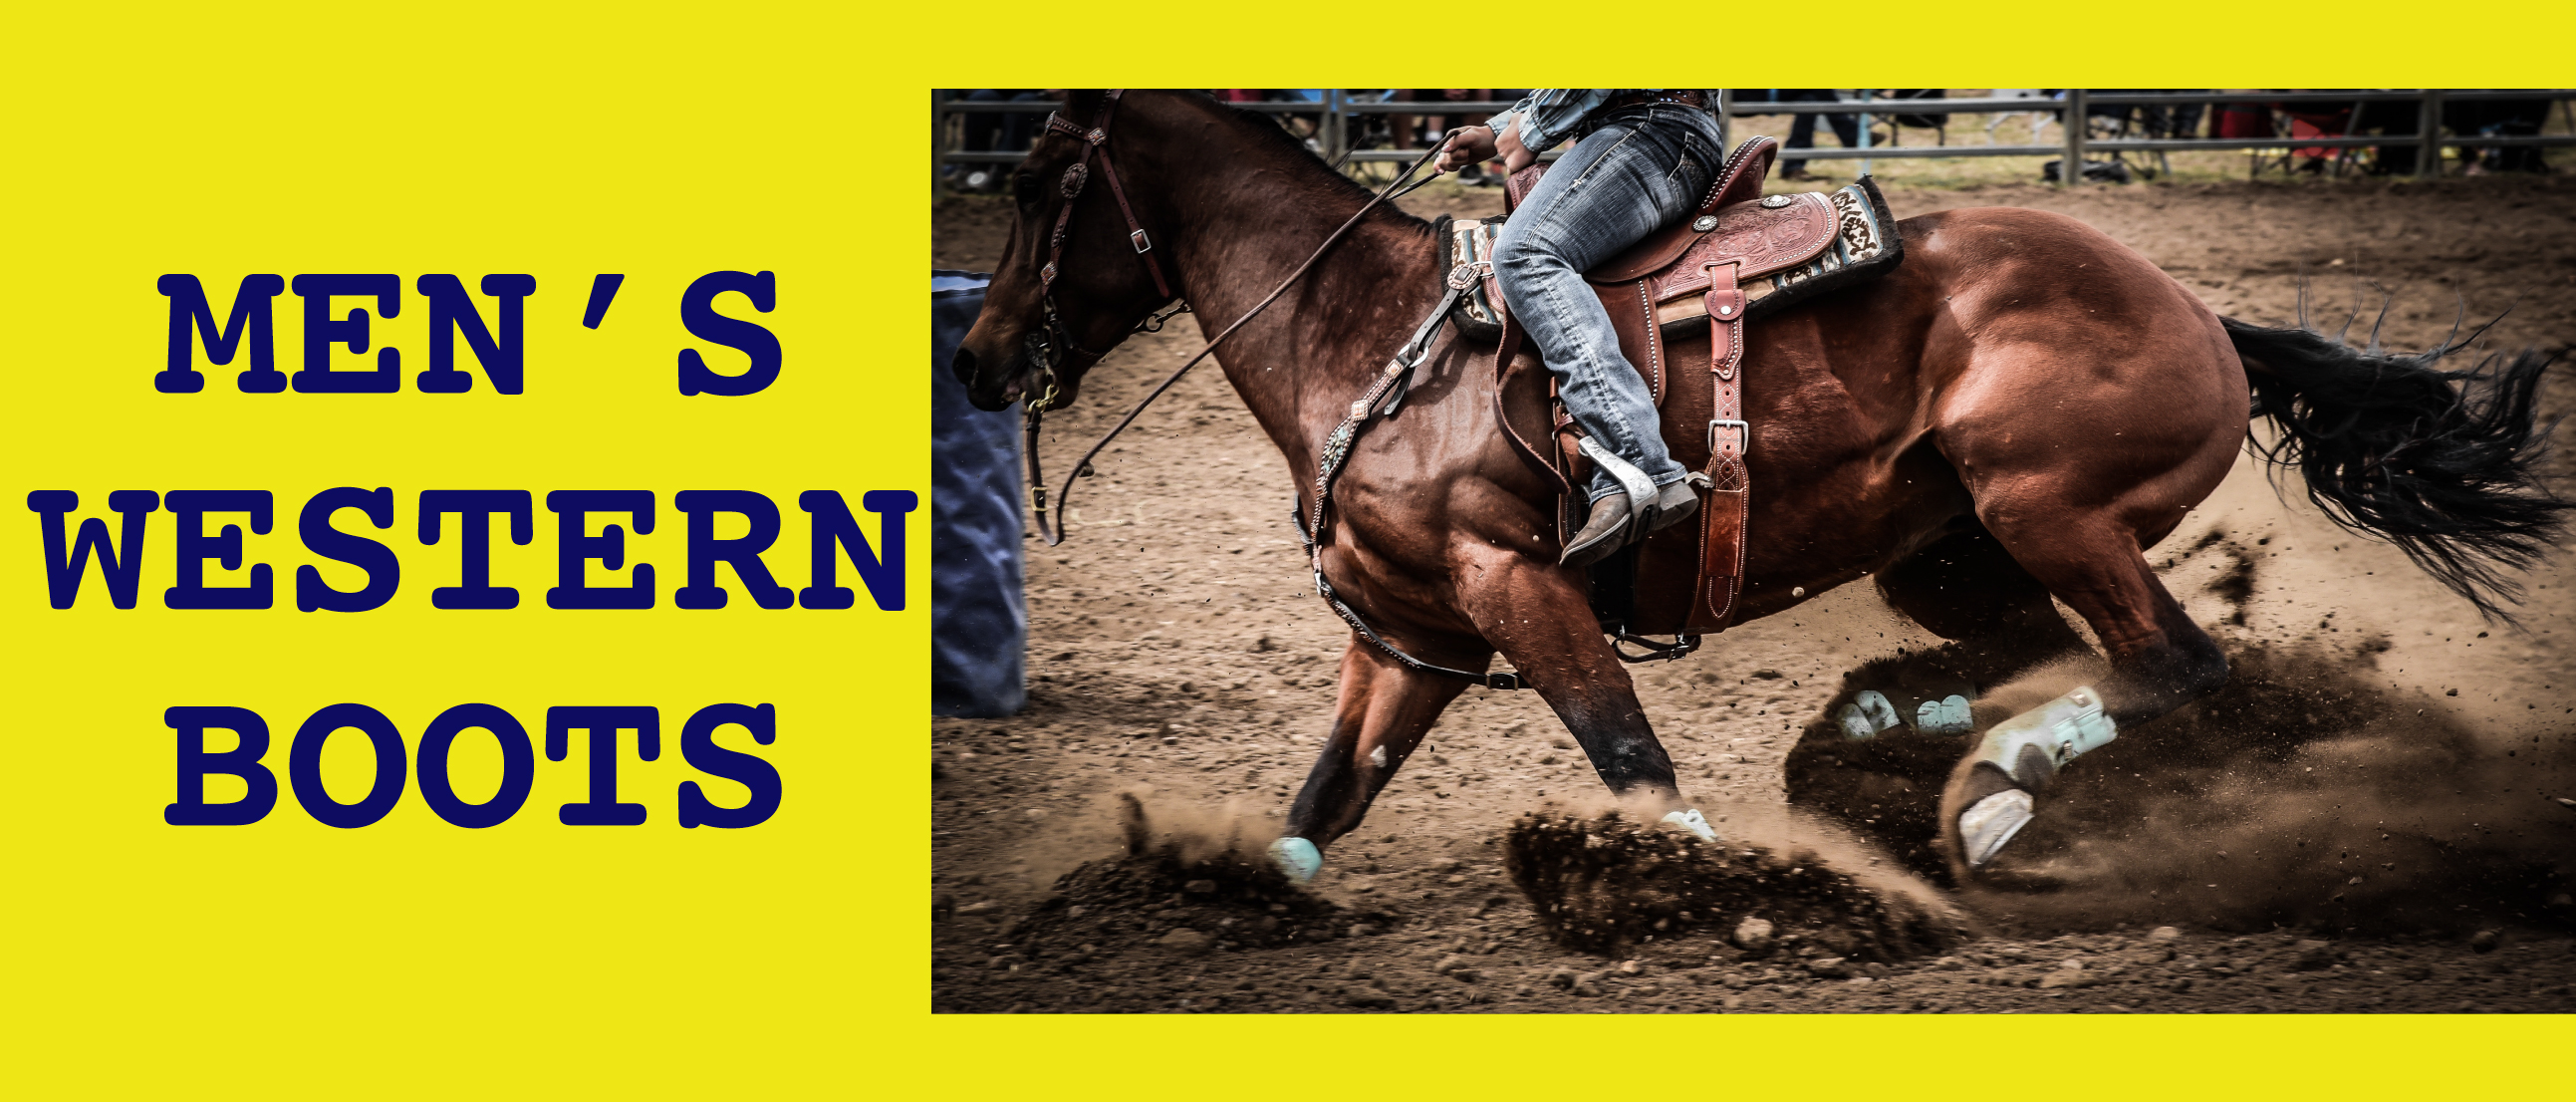 men-s-western-boots.jpg